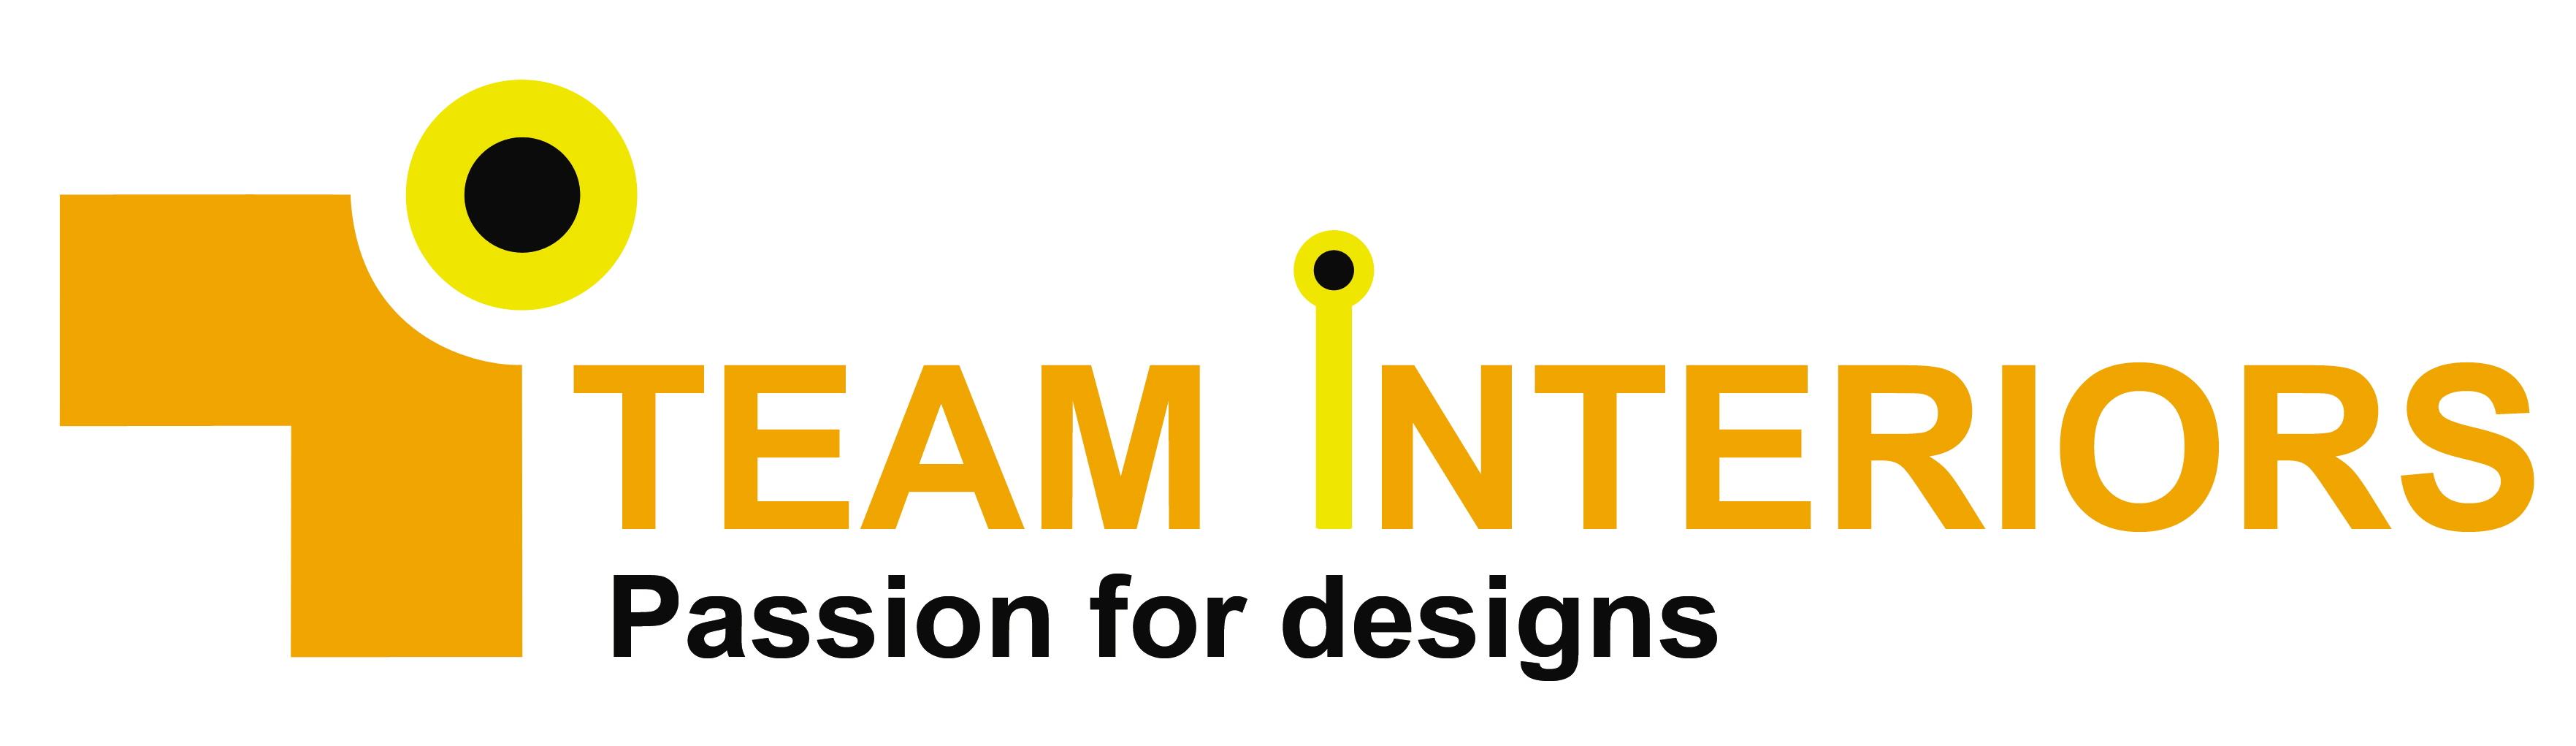 QView Full Size Logo Design